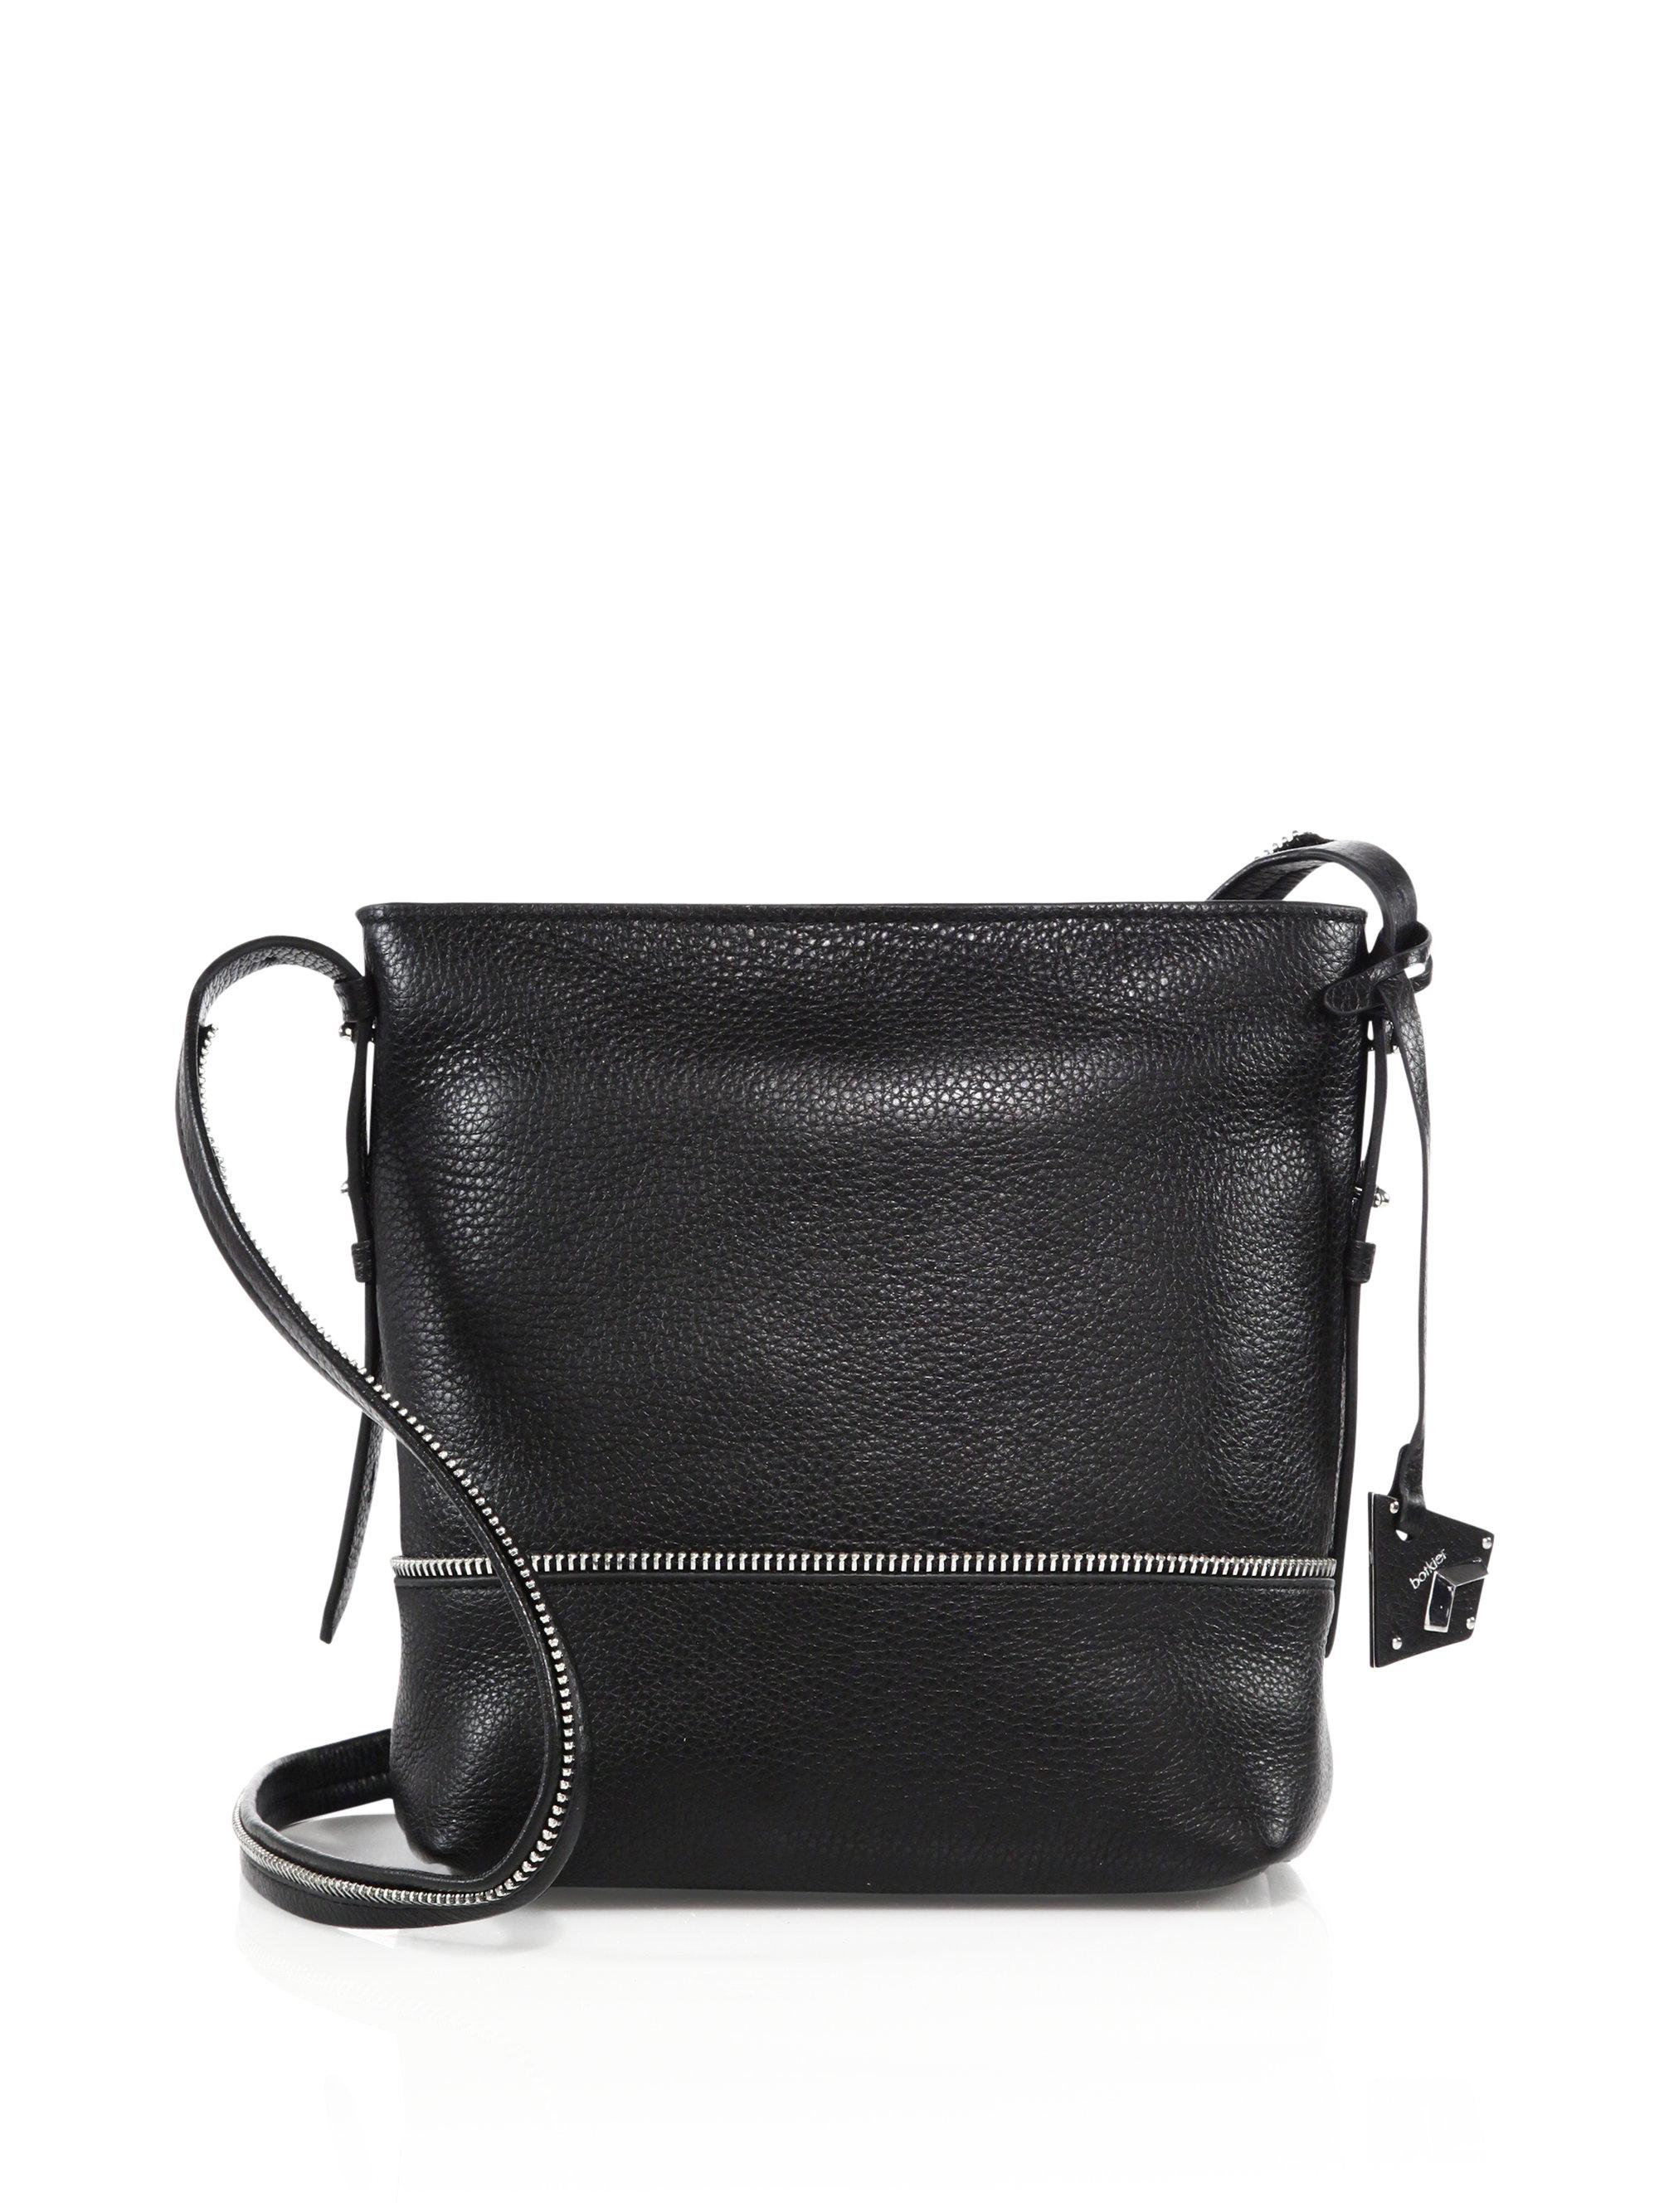 Botkier Soho Leather Crossbody Bag in Black